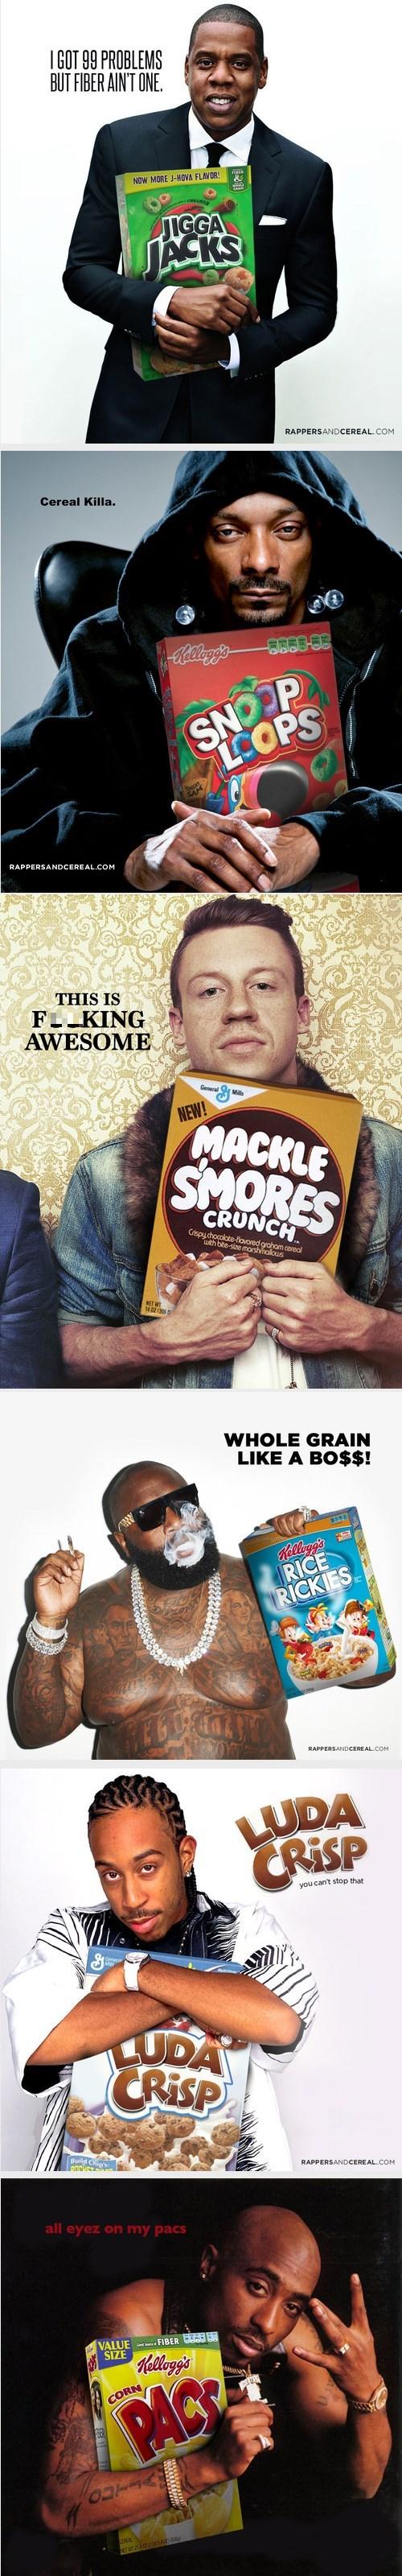 rappers tupac shakur Macklemore ludacris rick ross snoop dogg cereal Jay Z - 7703724032